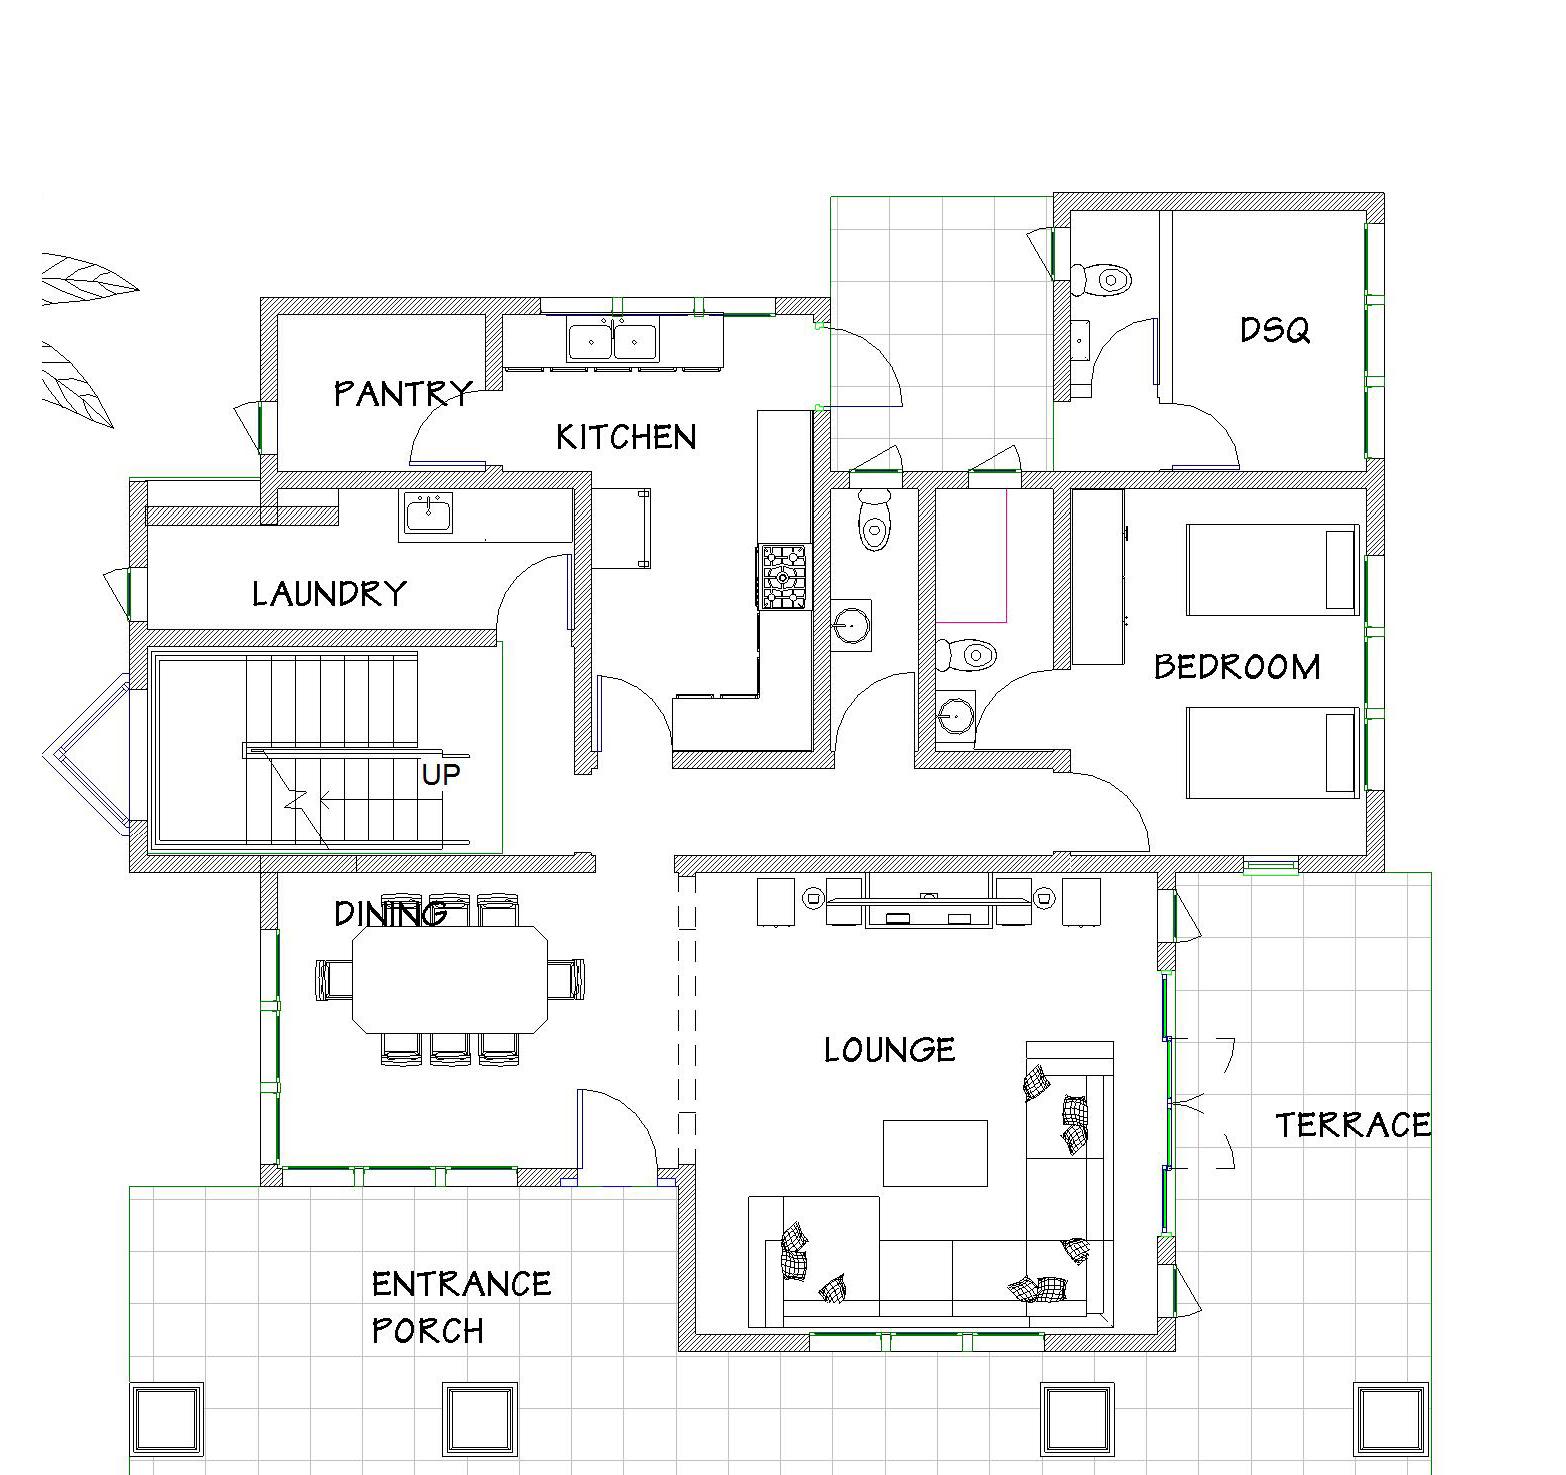 4-Bedroom Redhill House Plans | David Chola - Architect